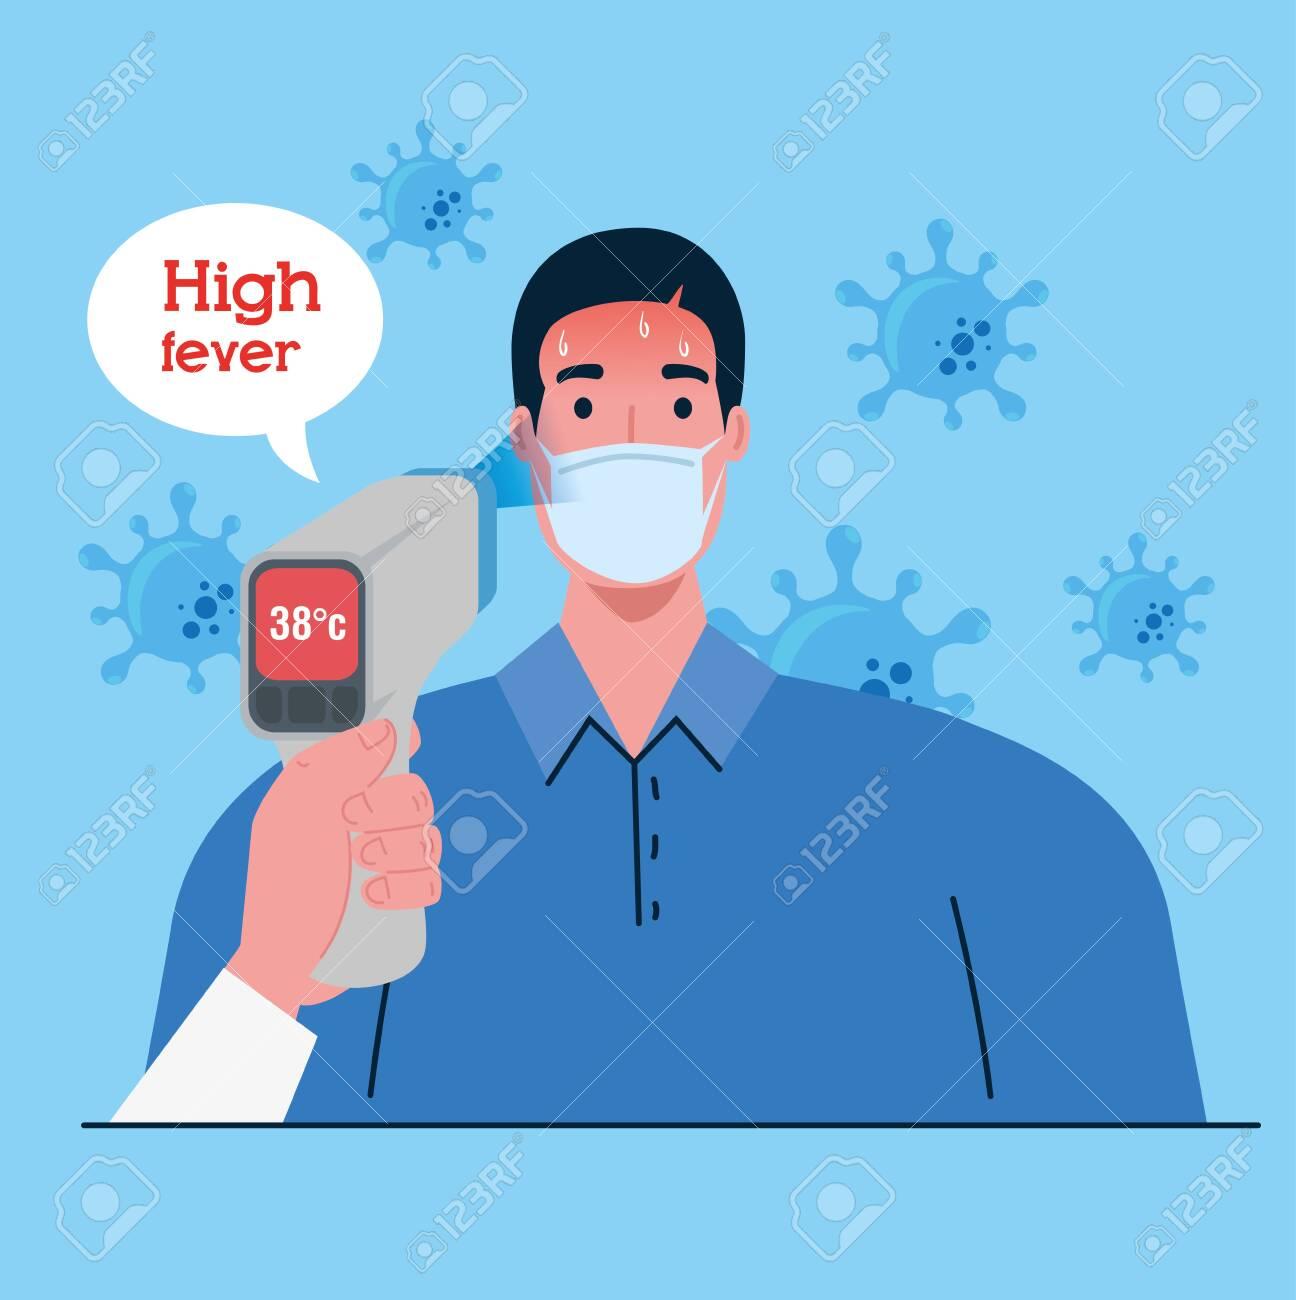 Covid 19 Coronavirus Hand Holding Infrared Thermometer To Measure Body Temperature Man With High Temperature Fever Concept Vector Illustration Design Ilustraciones Vectoriales Clip Art Vectorizado Libre De Derechos Image 149432950